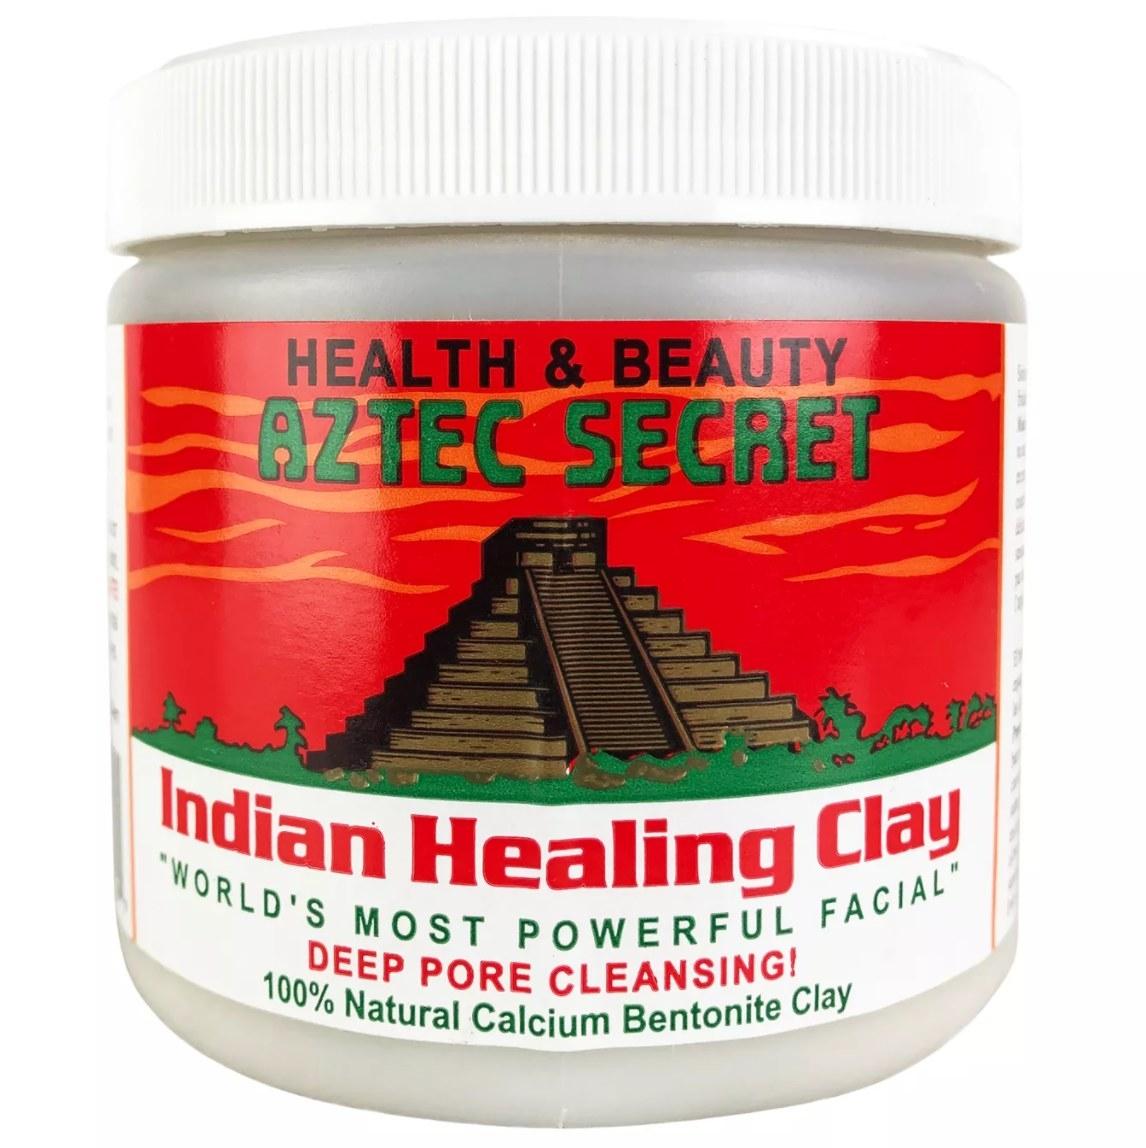 photo ofAztec Secret Indian Healing Clay Mask against white background